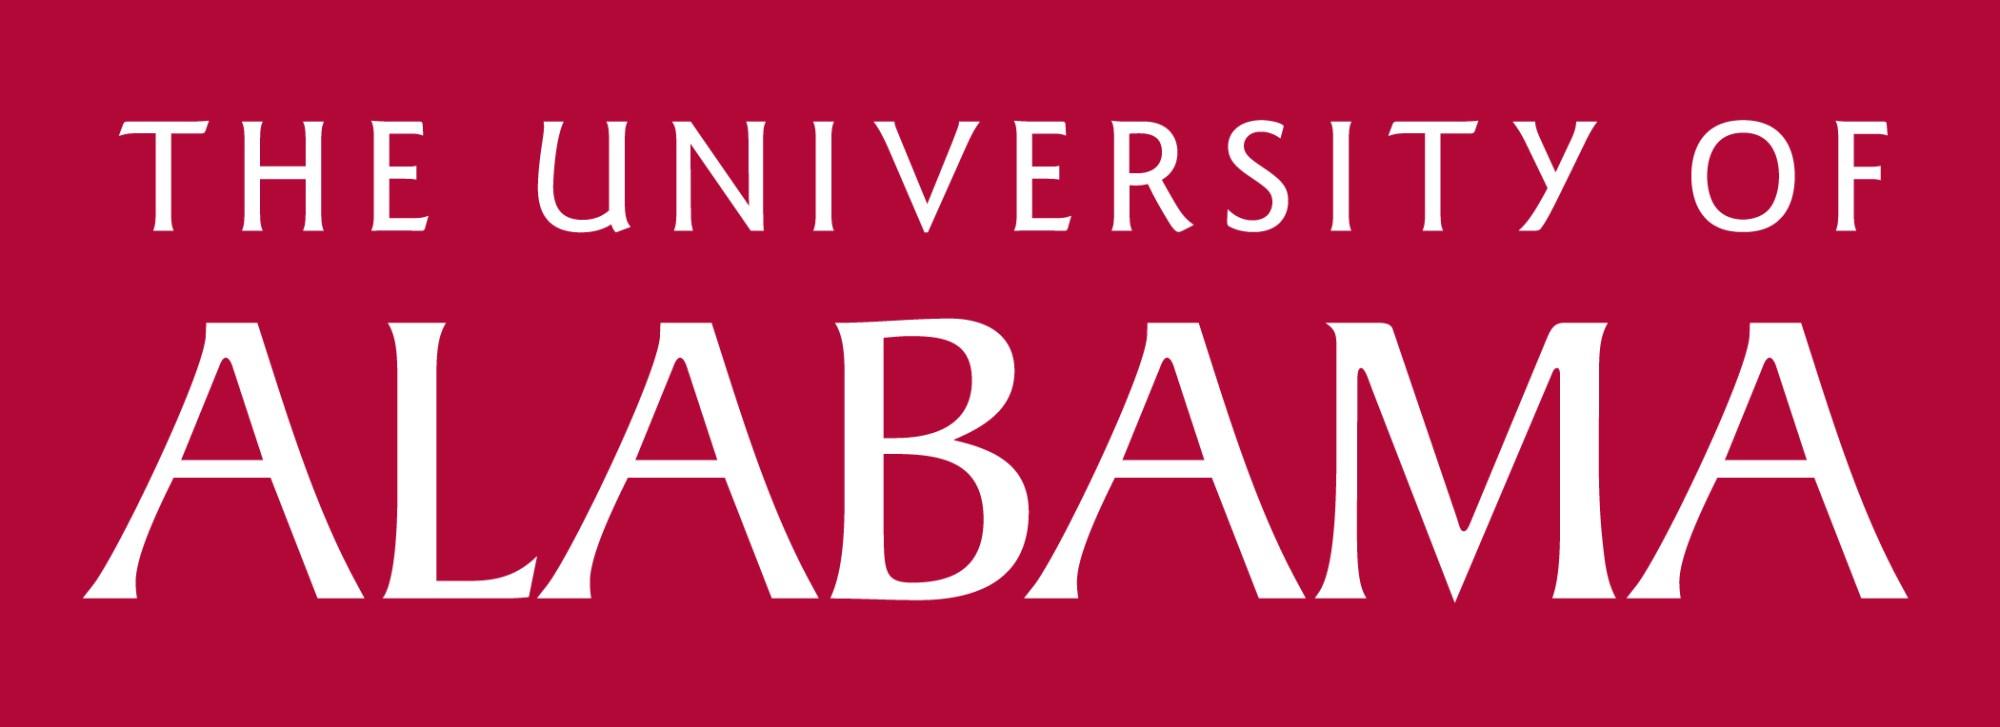 hight resolution of university of alabama fire